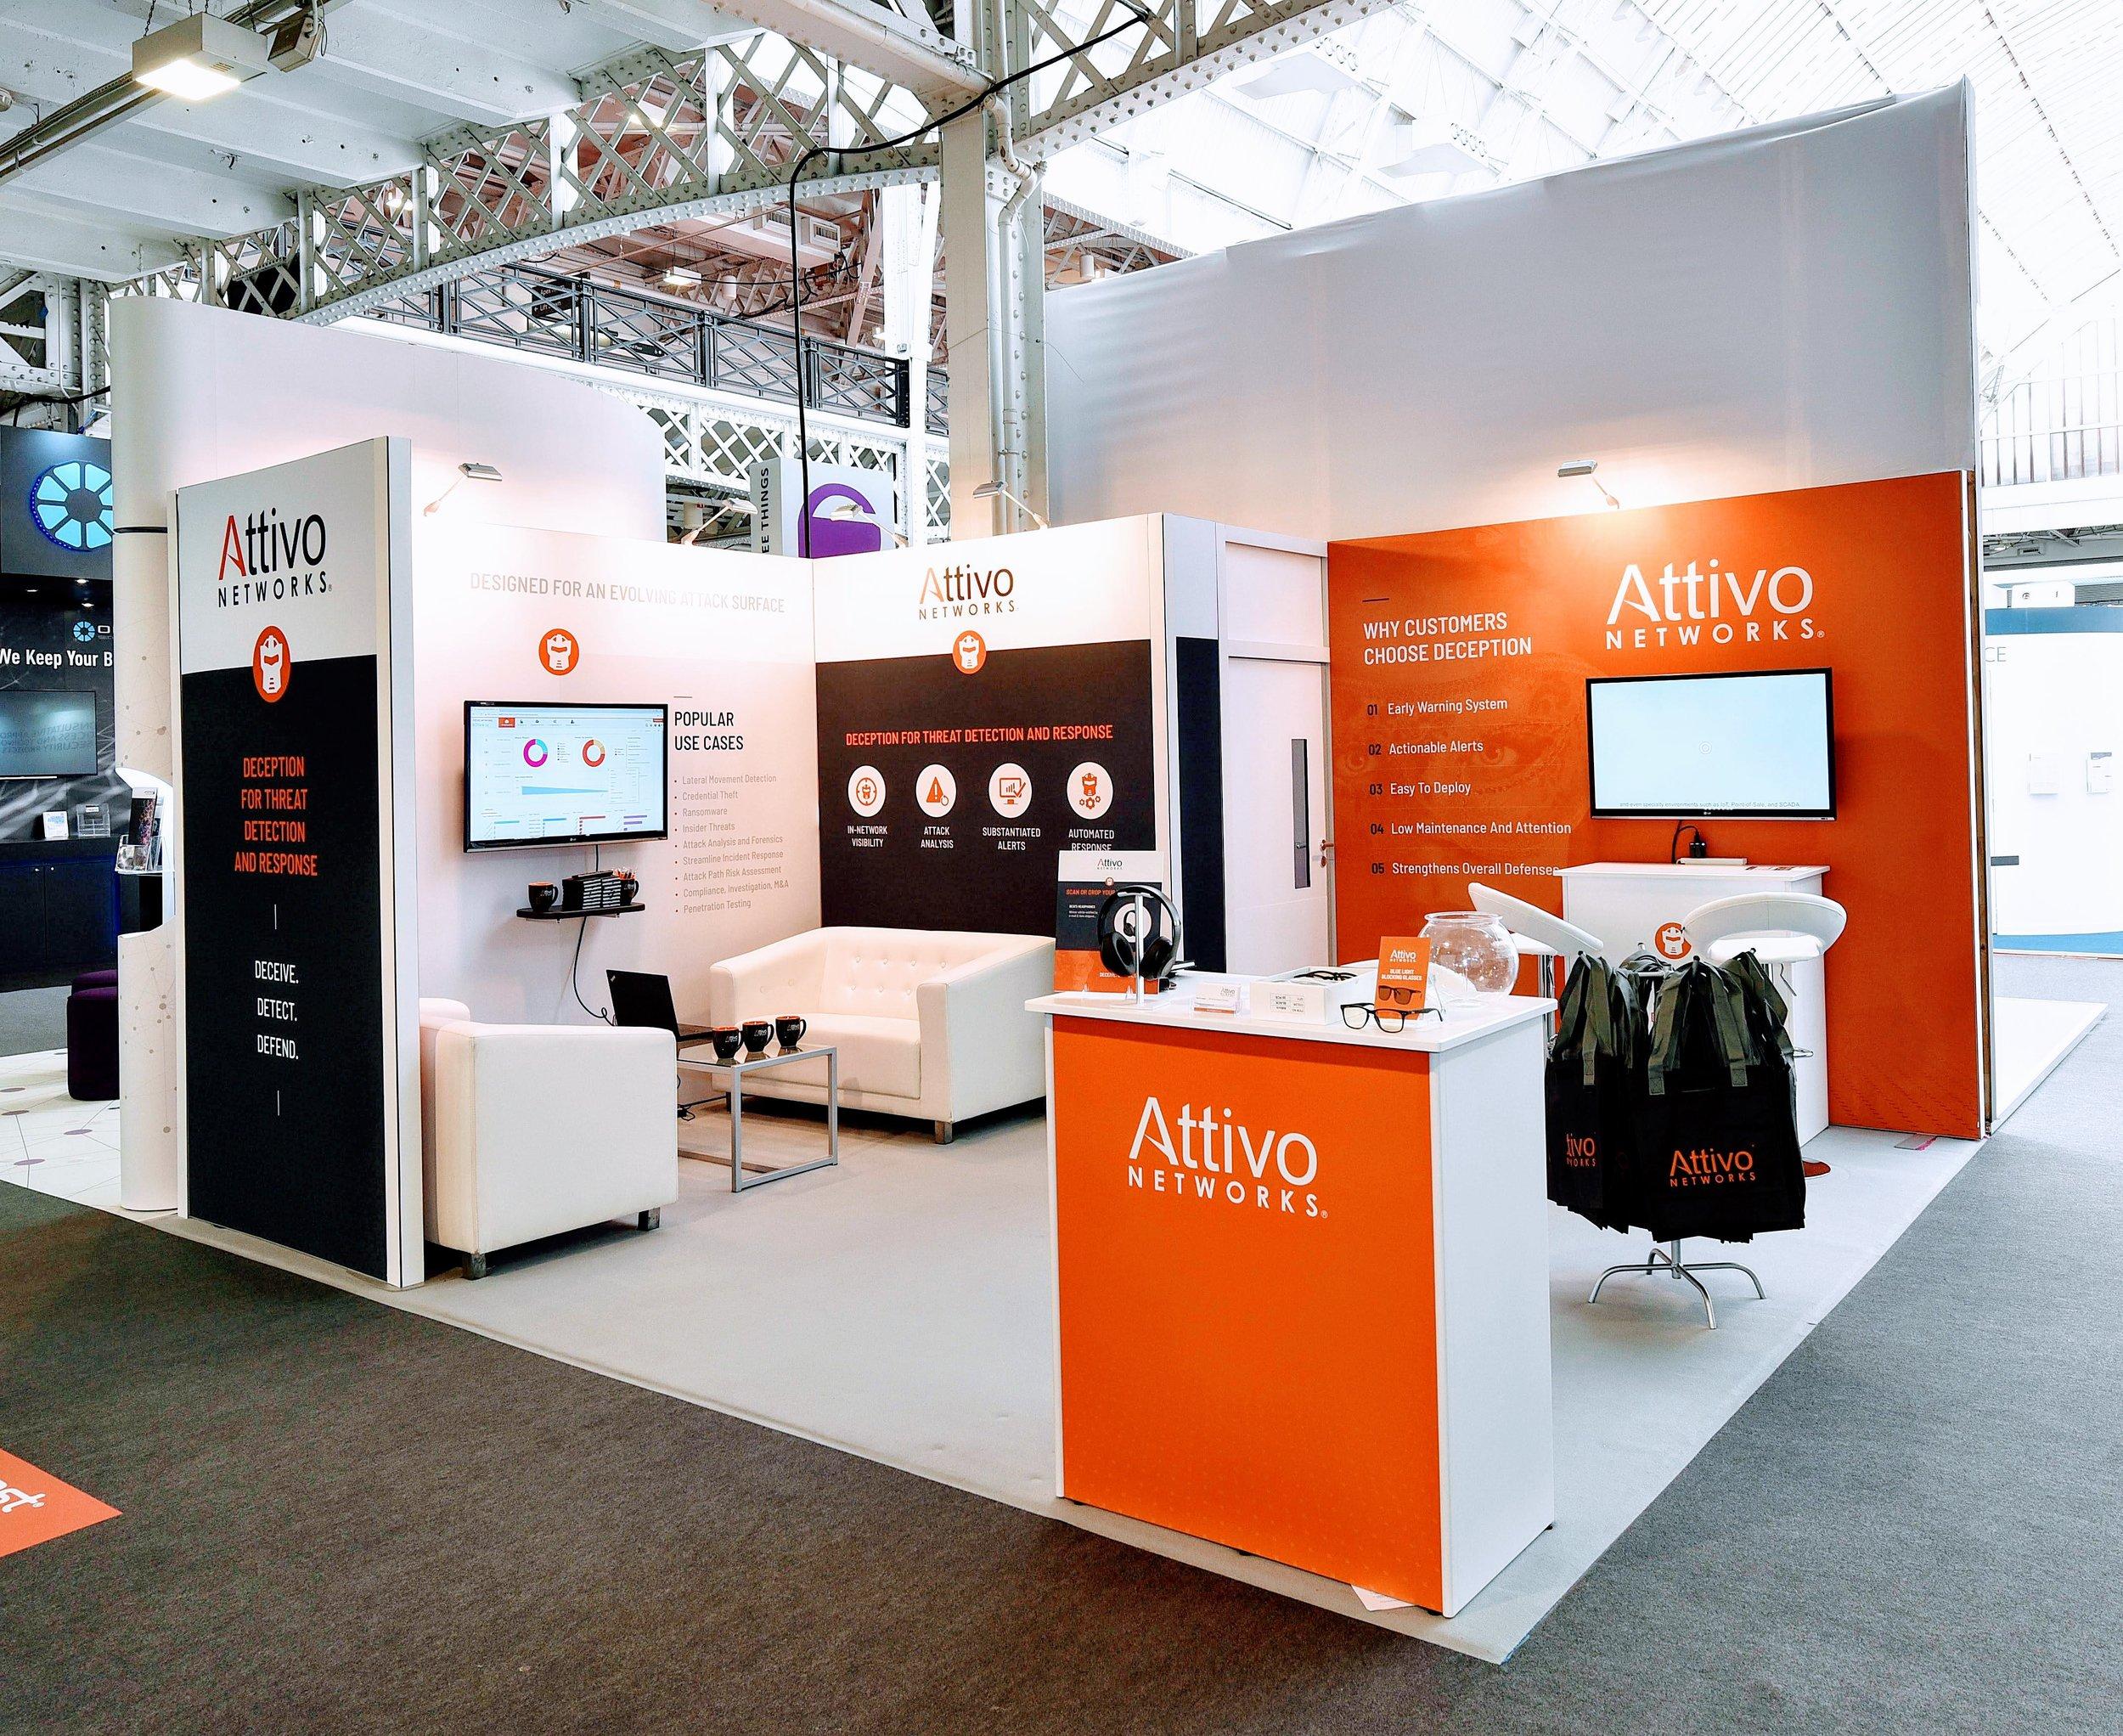 Attivo (wecompress.com) small.jpg